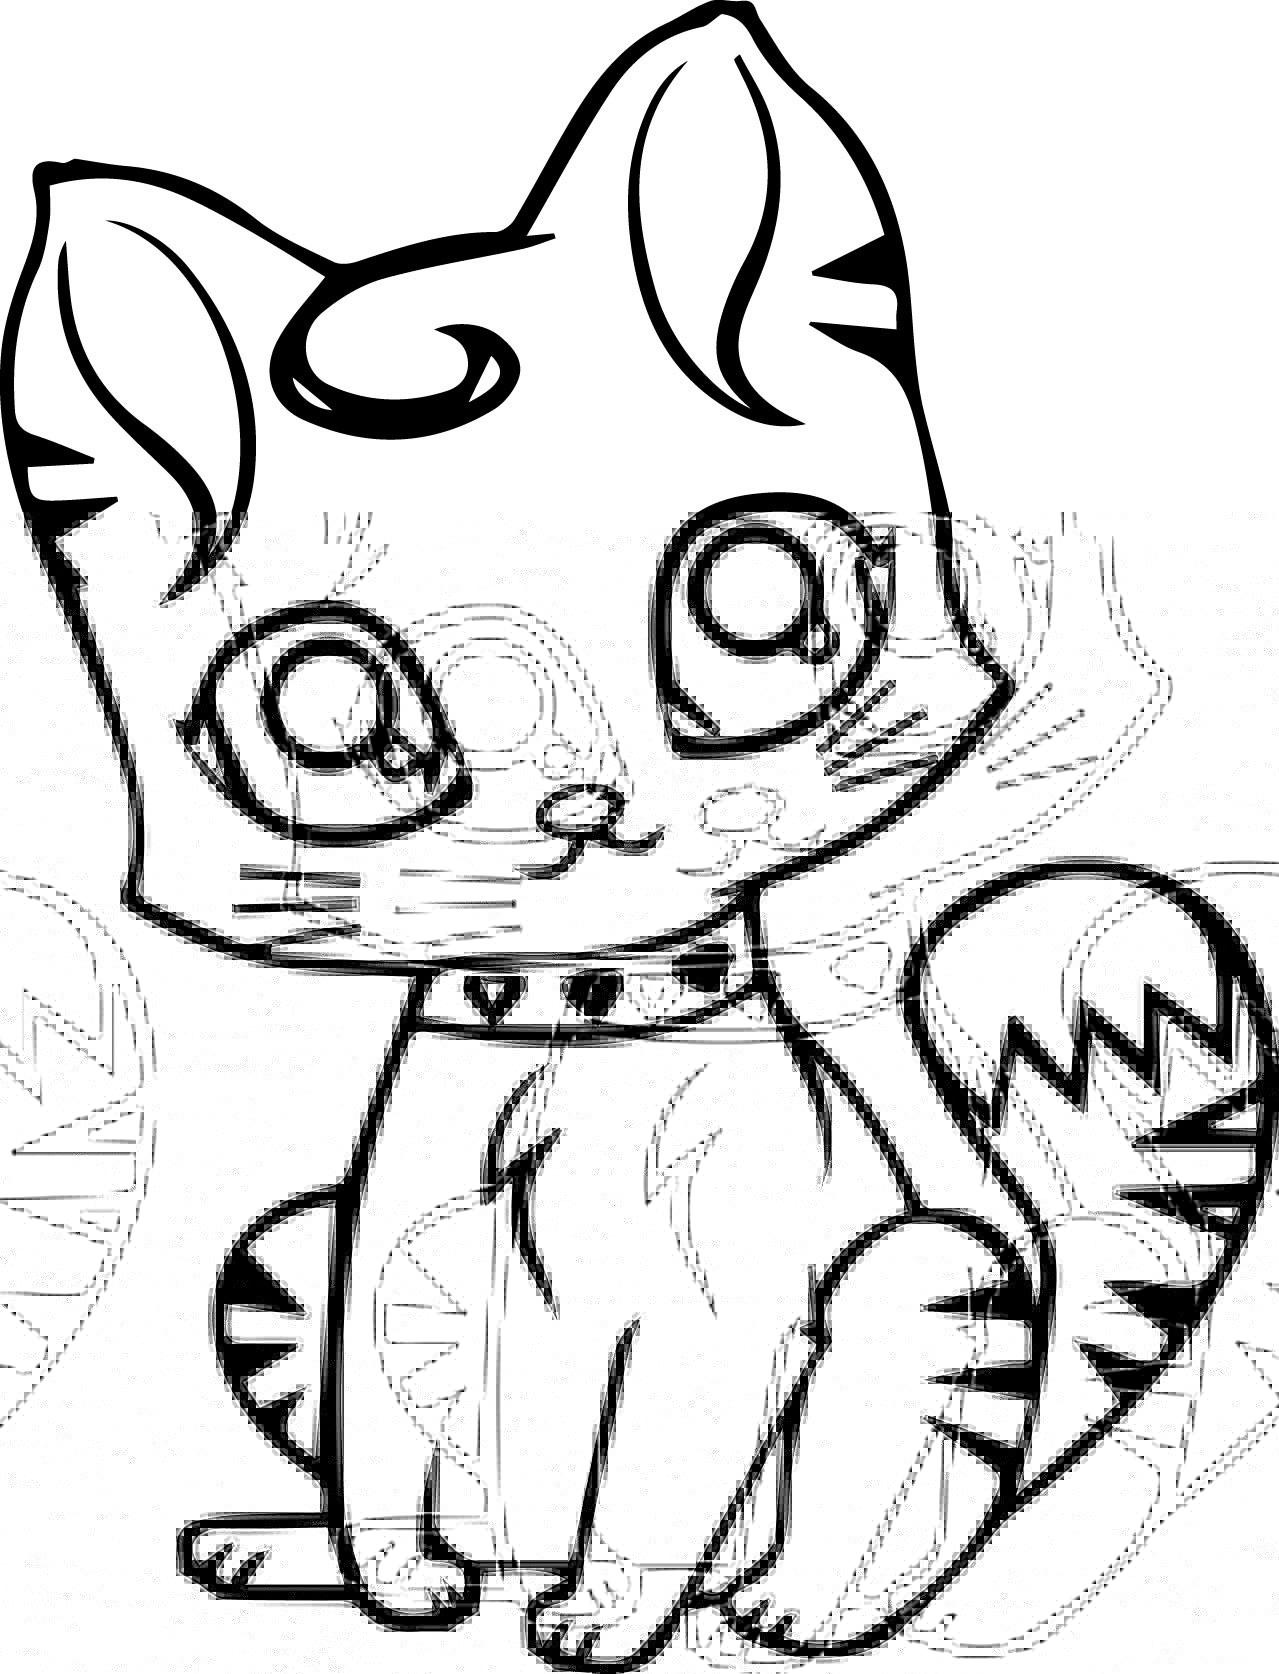 Desenhos De Gato Pequeno Bonito Para Colorir E Imprimir